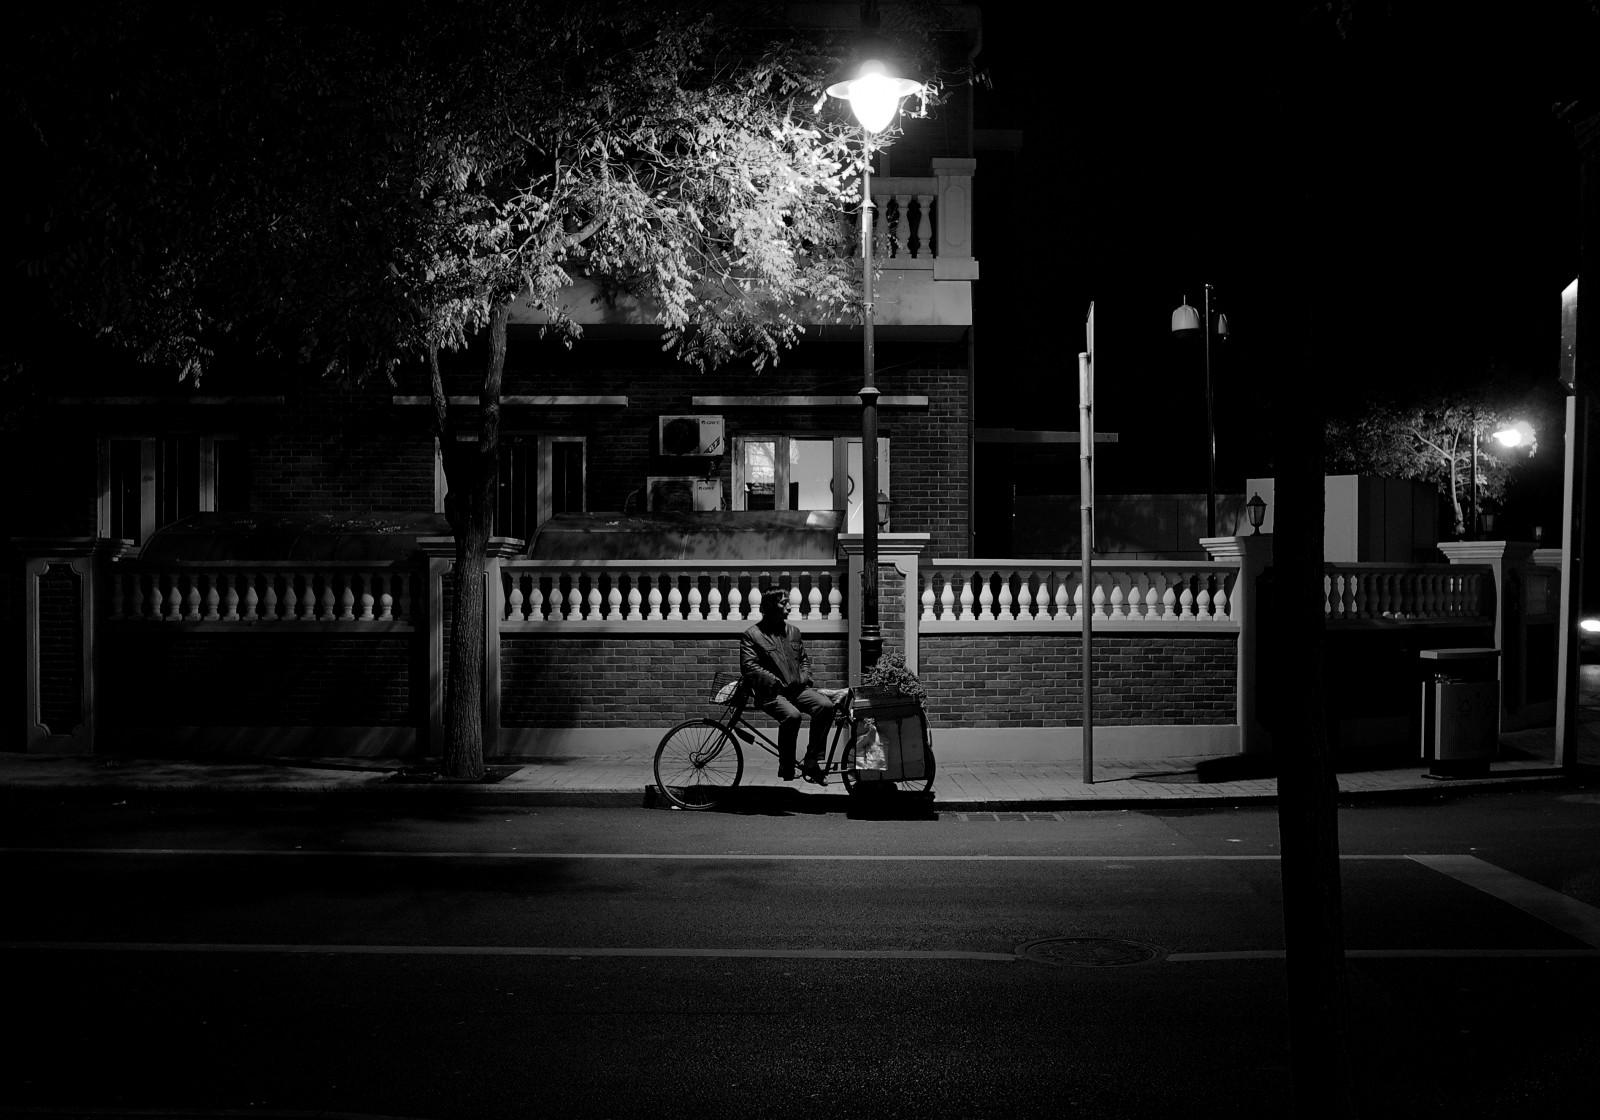 street light white black monochrome city street night road photography infrastructure light bw stories lighting shape photograph darkness snapshot black and white monochrome photography film noir